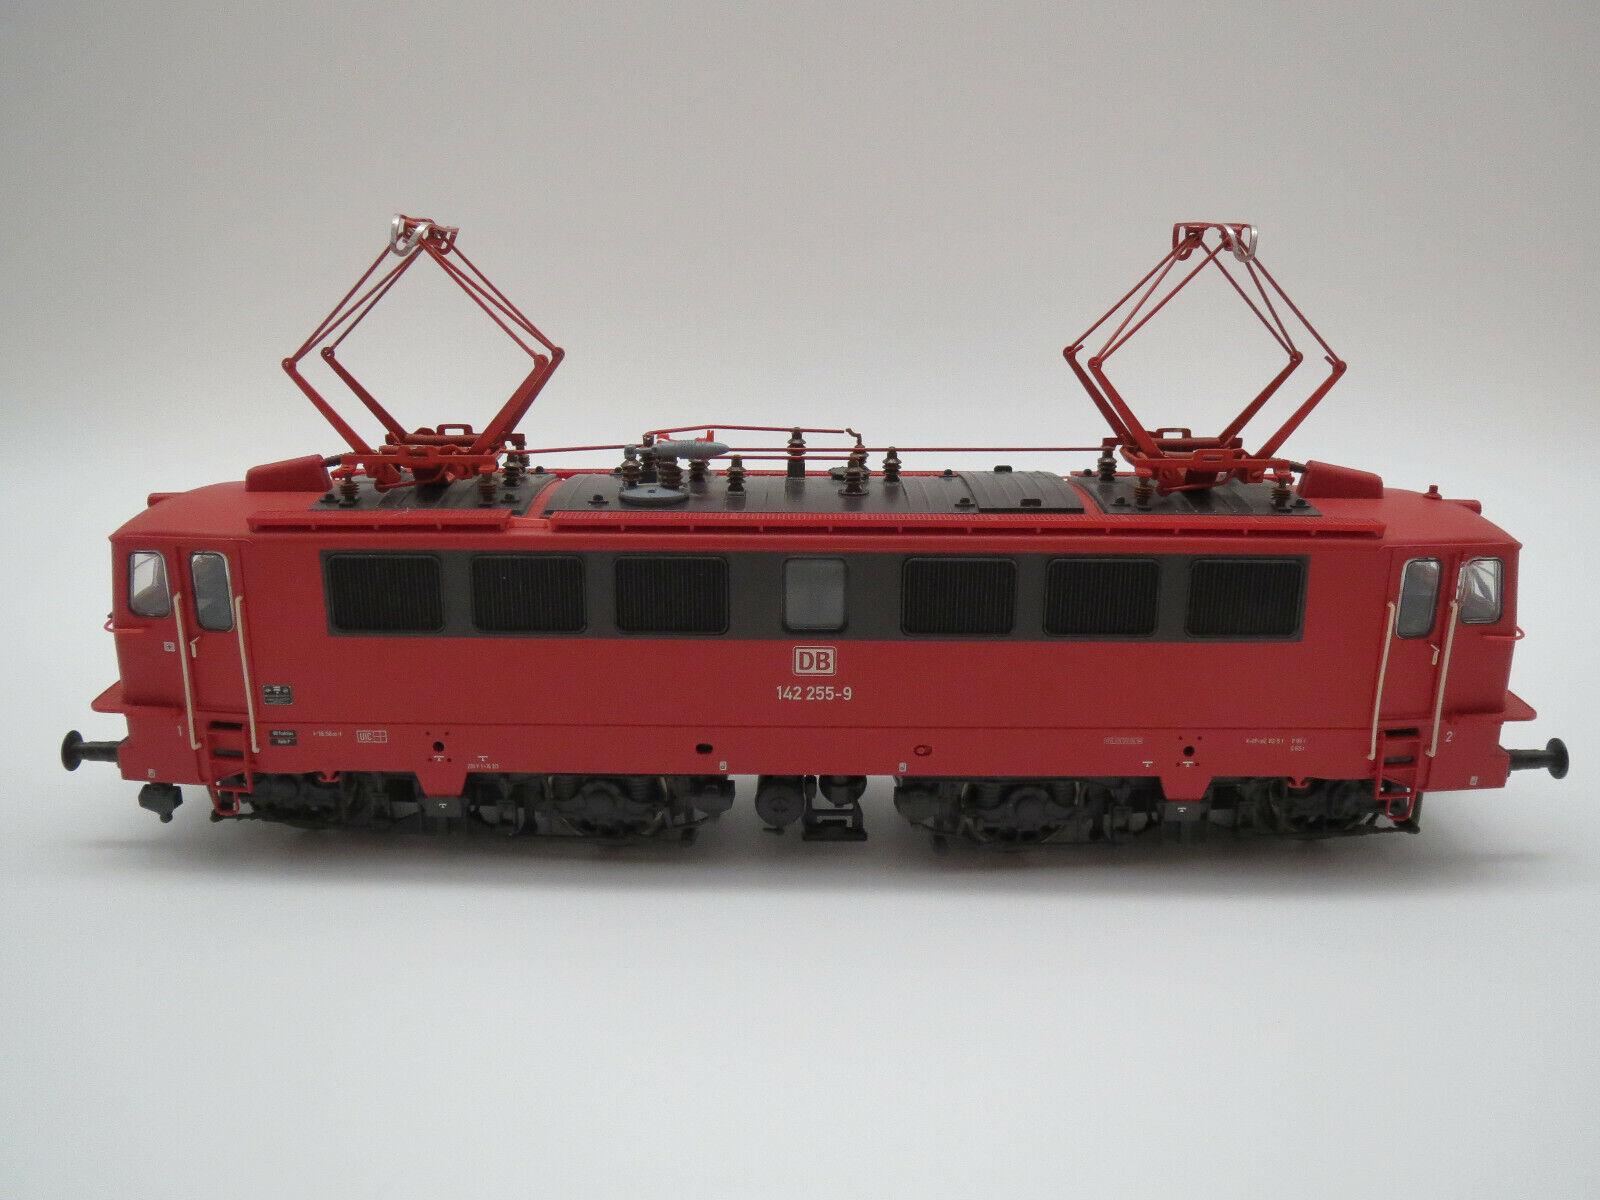 BRAWA H0 0203  E142 Elektrolokomotive - Betriebsnummer  DB 142 255-9  Rot - OVP-